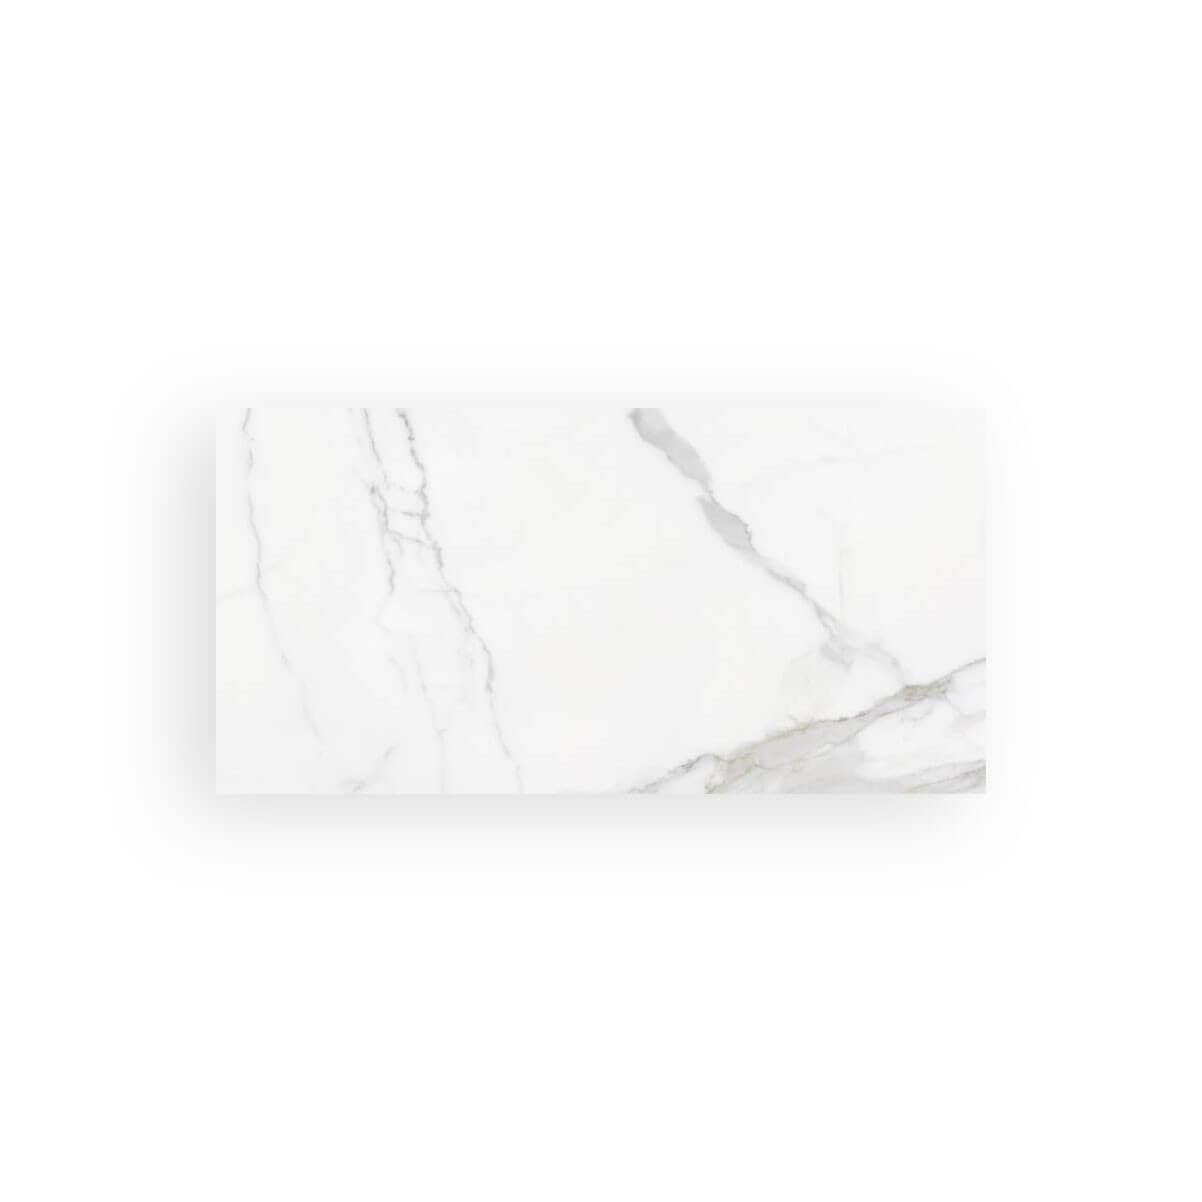 Carrelage sol aspect marbre Statuario Mate 30x60